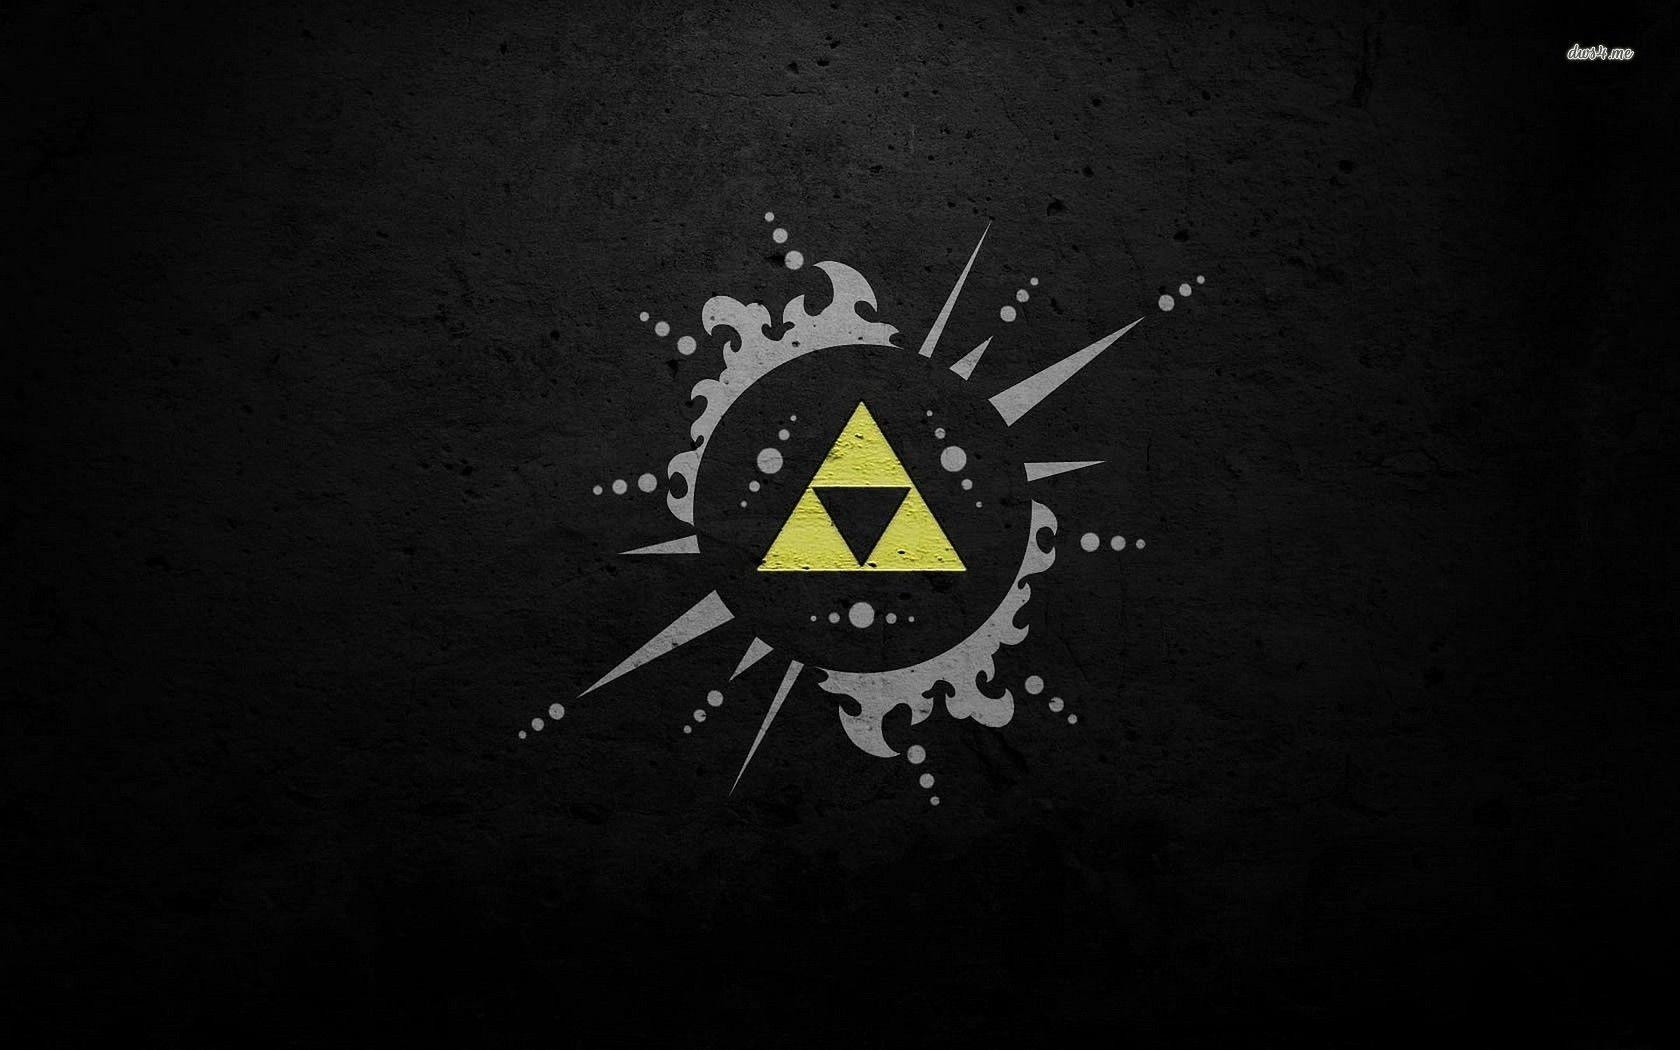 The Legend Of Zelda Backgrounds Group (85+)